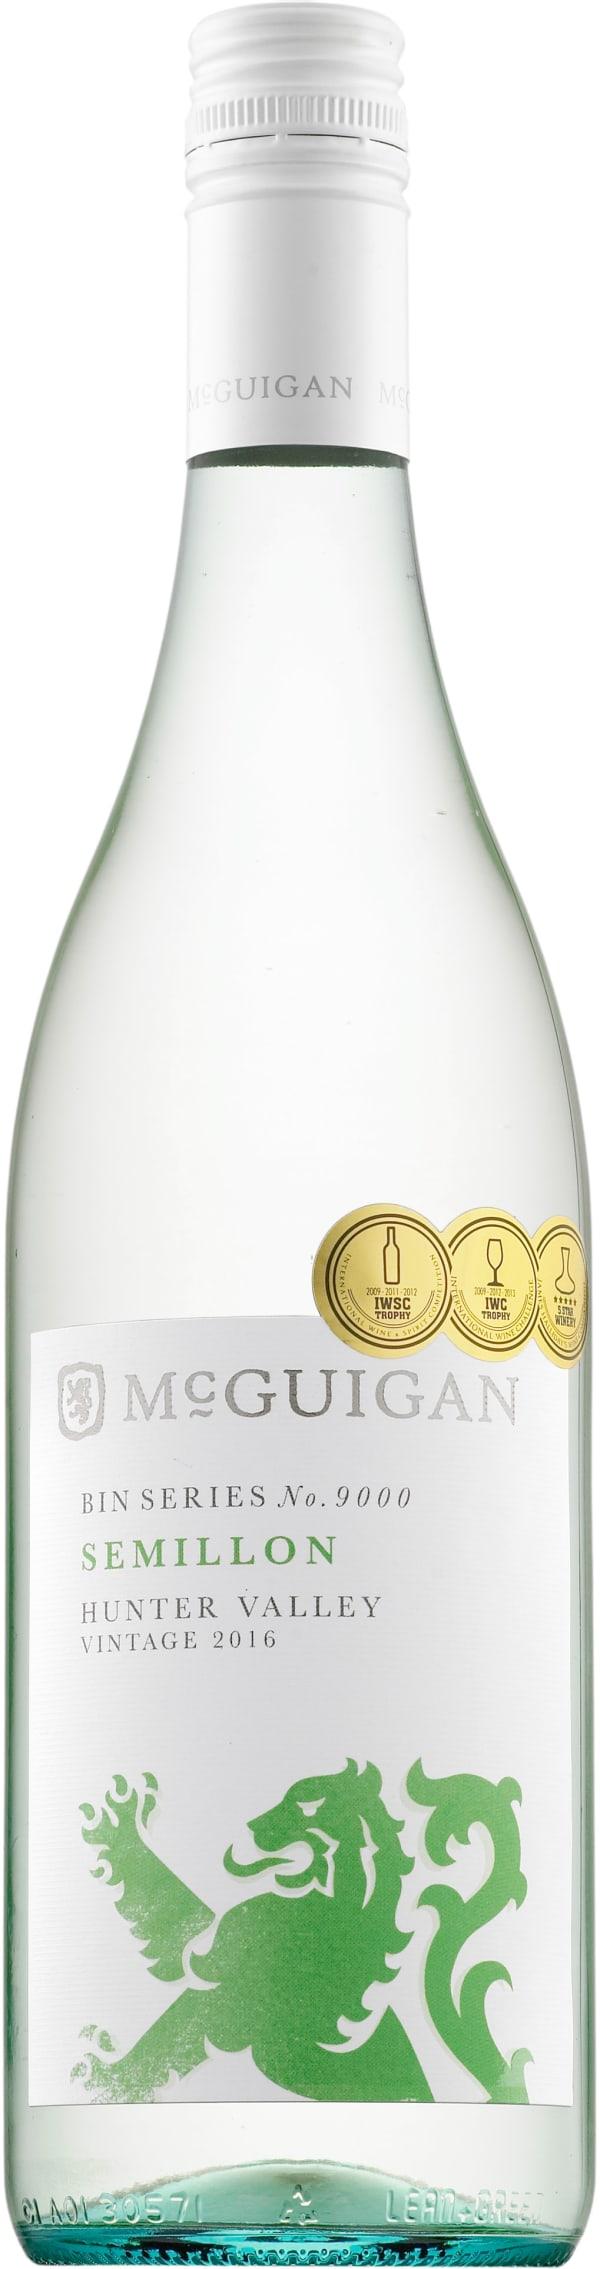 McGuigan Bin 9000 Sémillon 2016